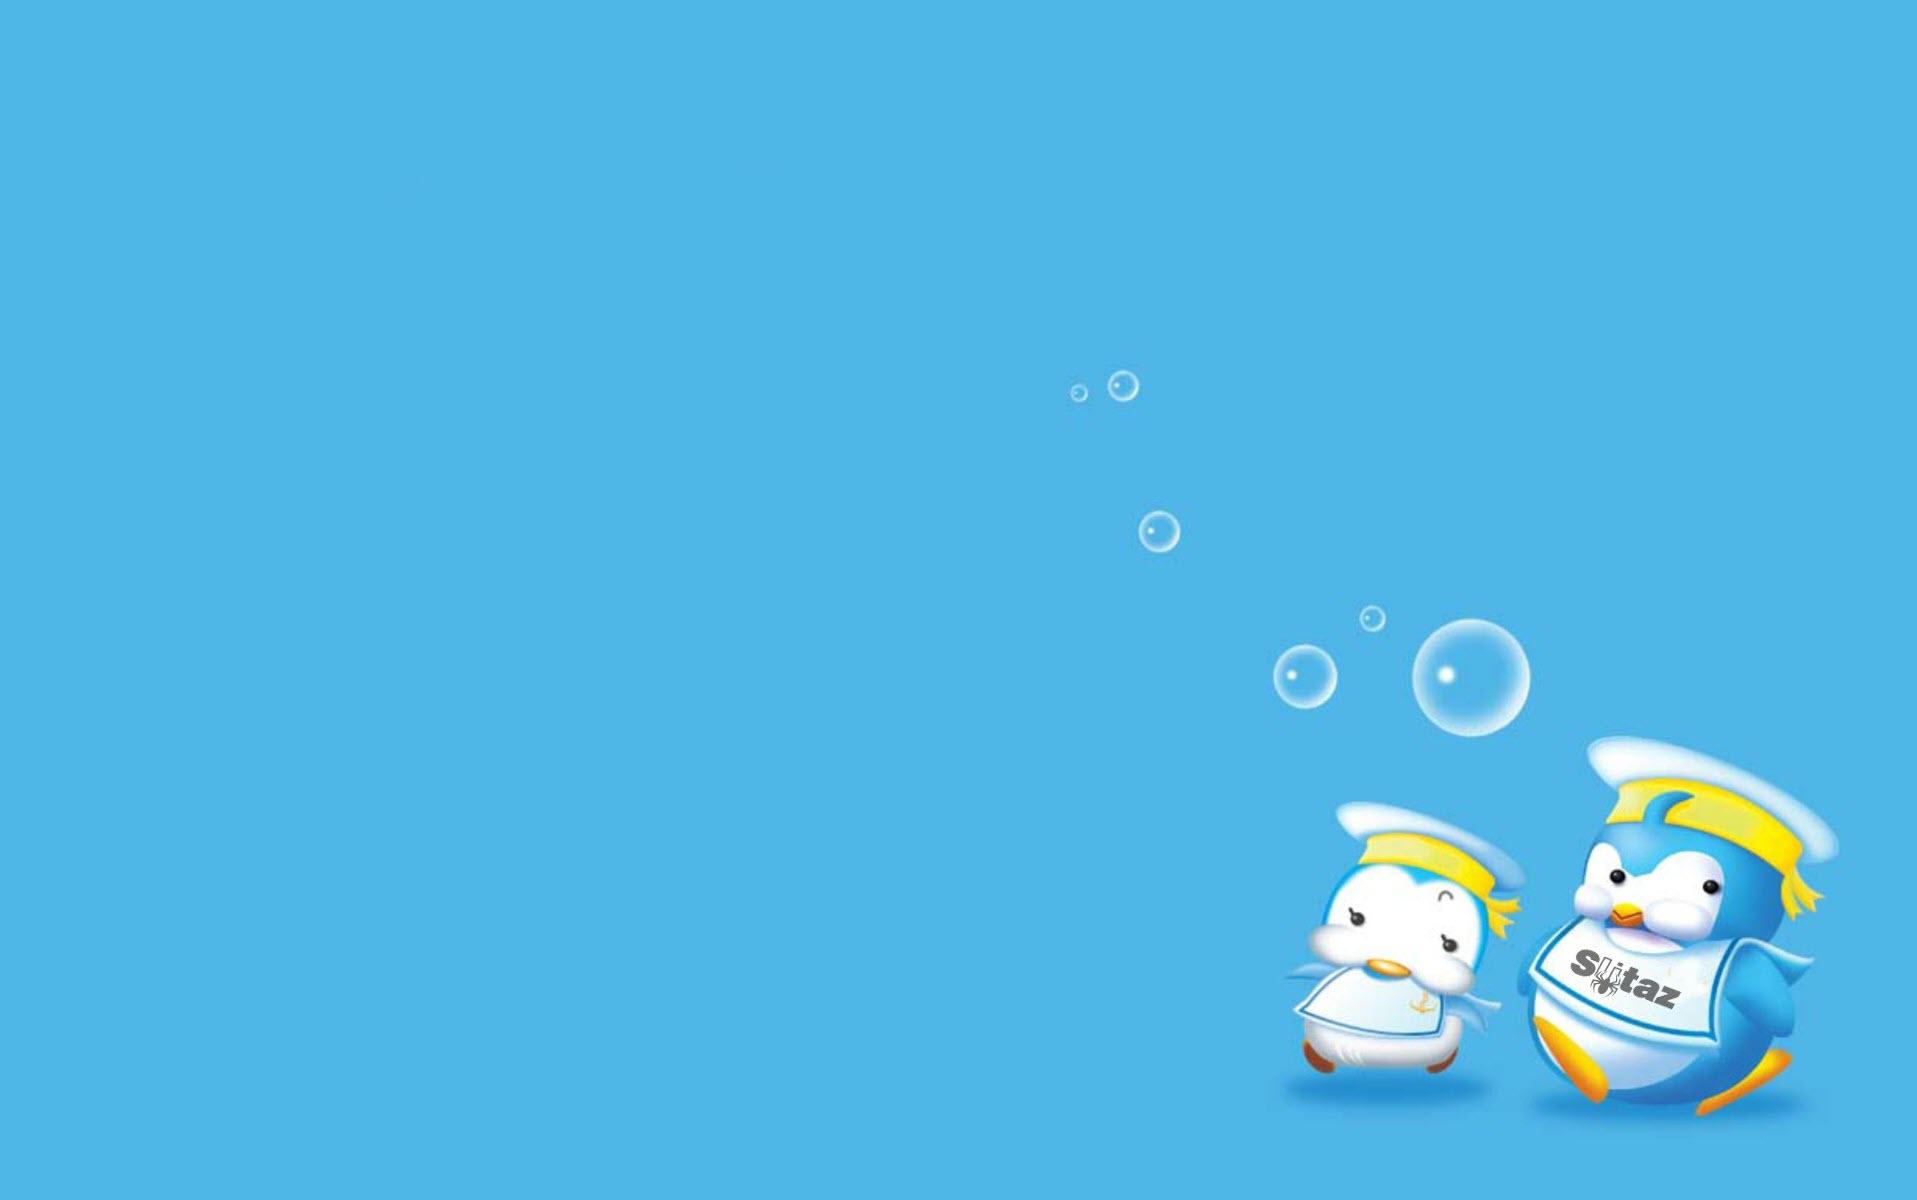 hinh-nen-cute-cho-may-tinh-dep-nhat-wallppaer-cute-2.jpg